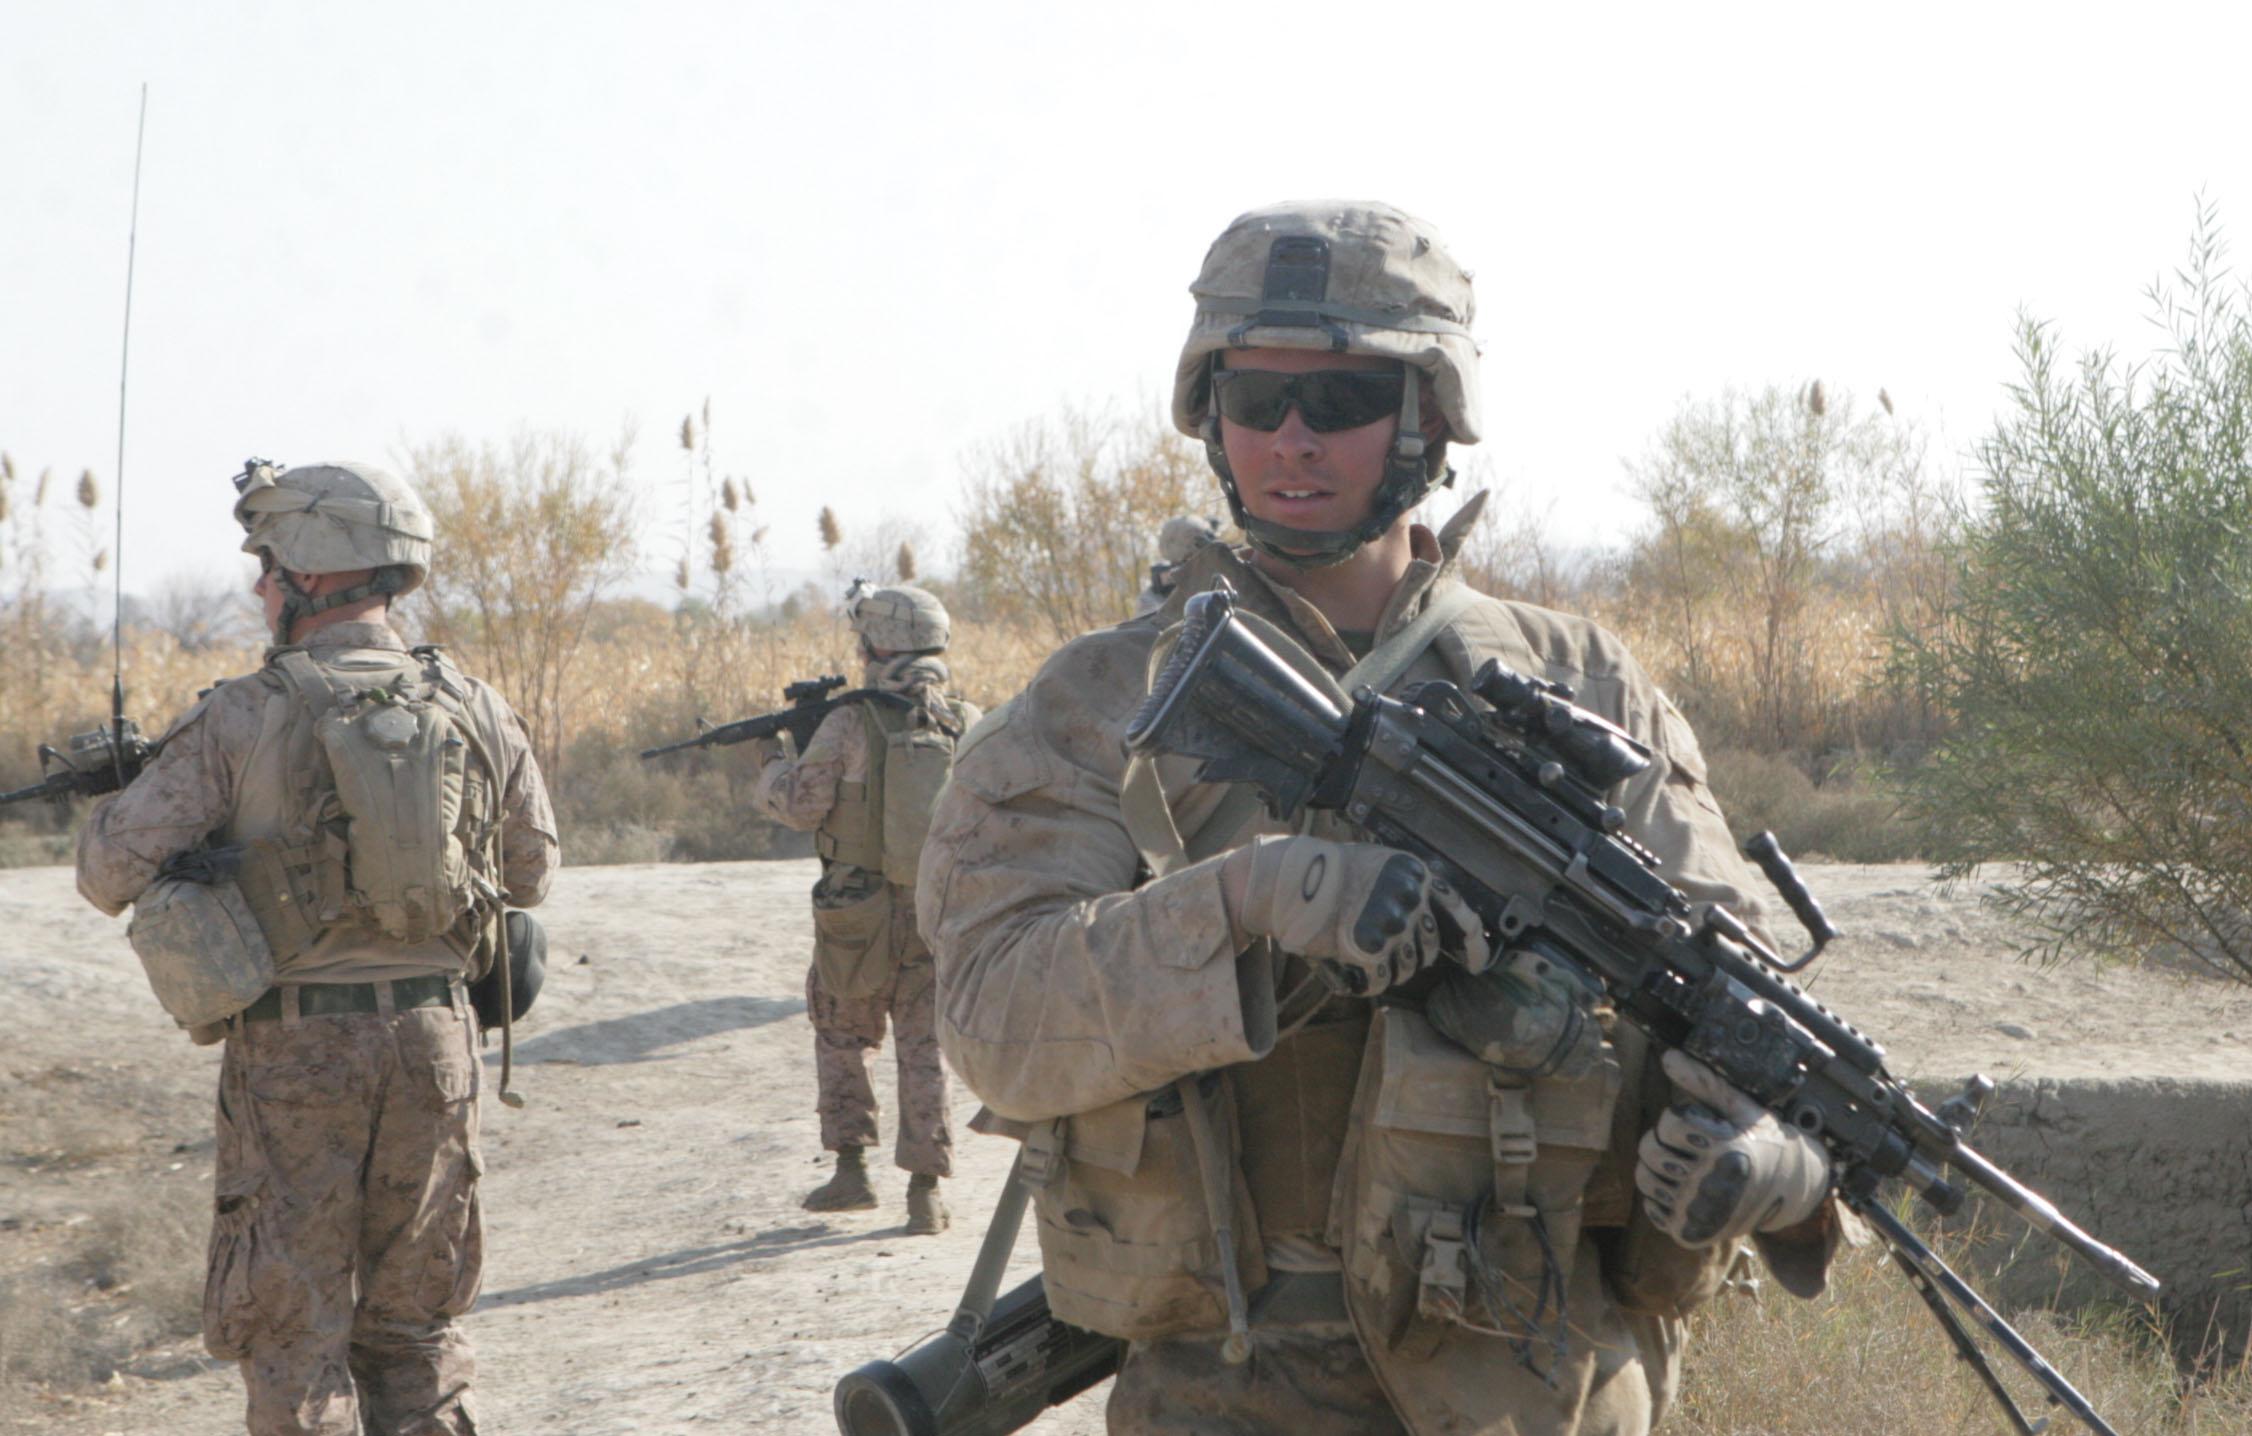 File:U.S. Marine Corps Lance Cpl. Garrett Gamble, an M249 light ...